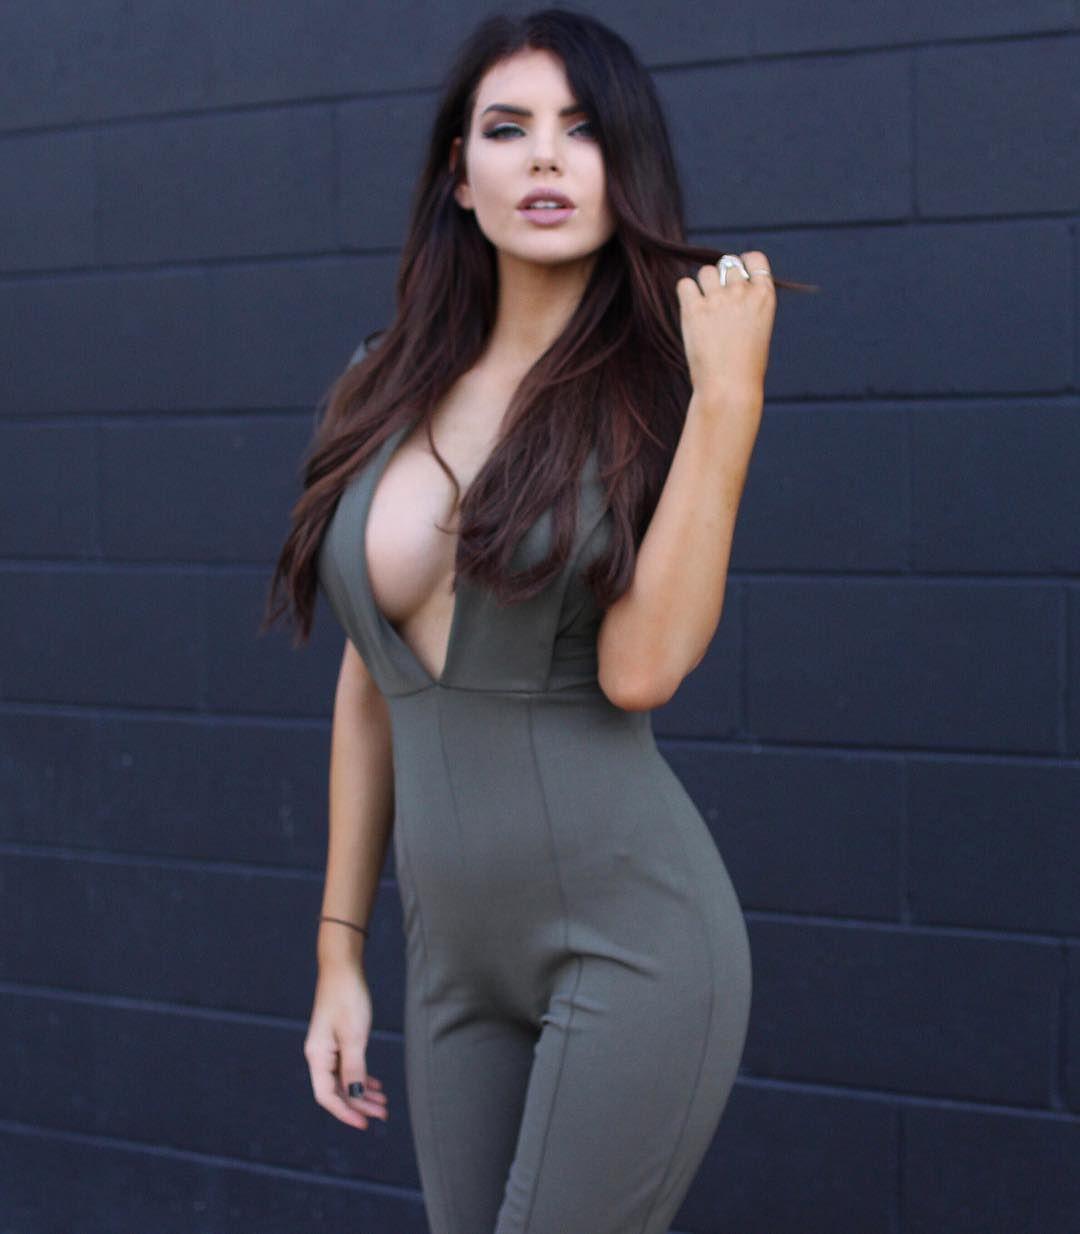 ICloud Nicole Thorne nude (79 foto and video), Ass, Sideboobs, Selfie, butt 2019